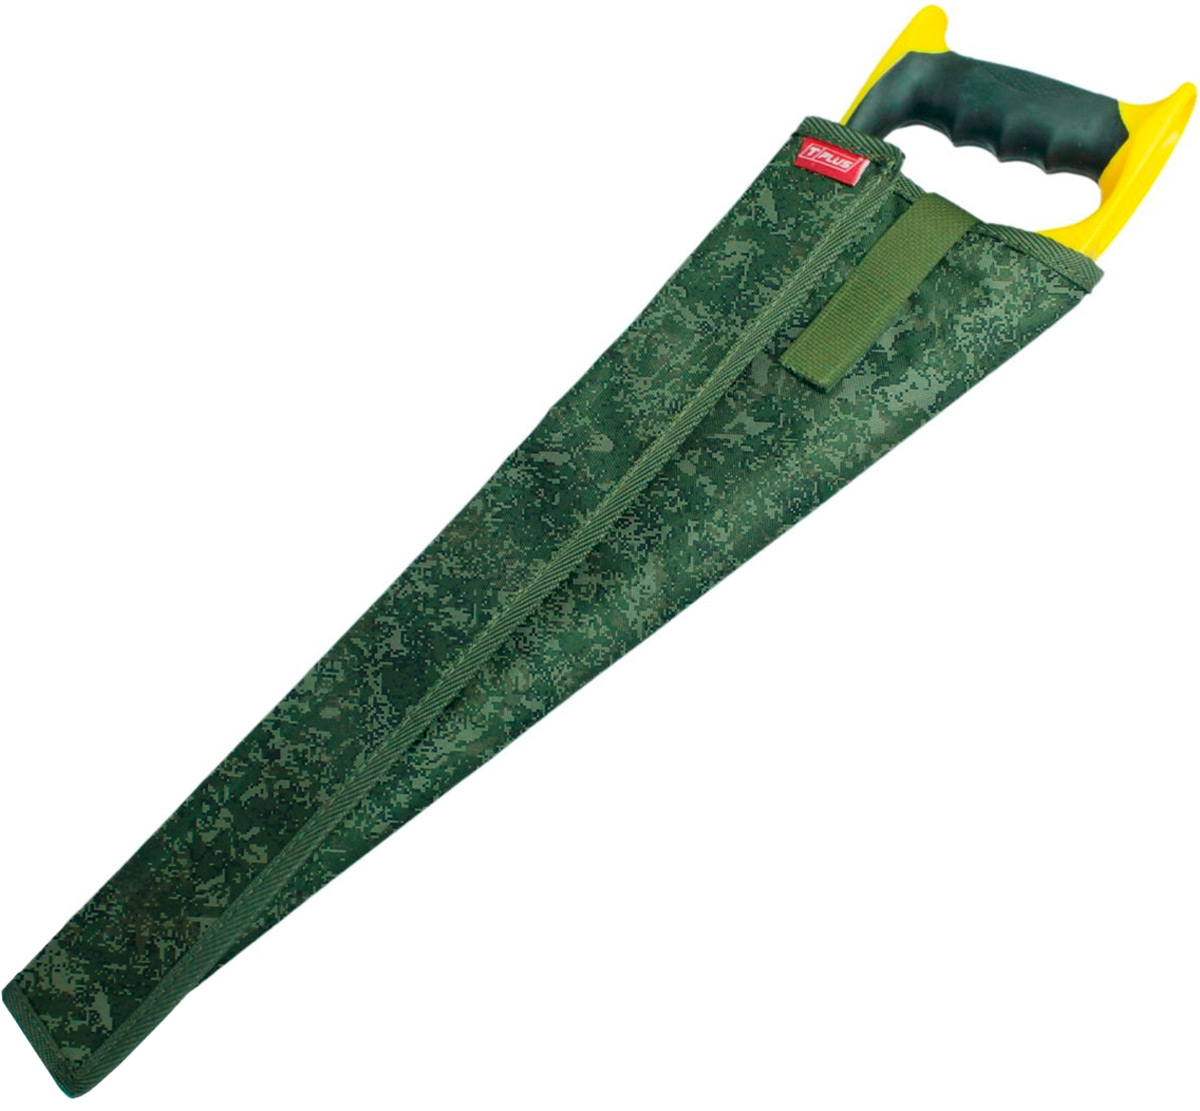 Чехол для ножовки Tplus, оксфорд 600, цвет: цифра, 40 см